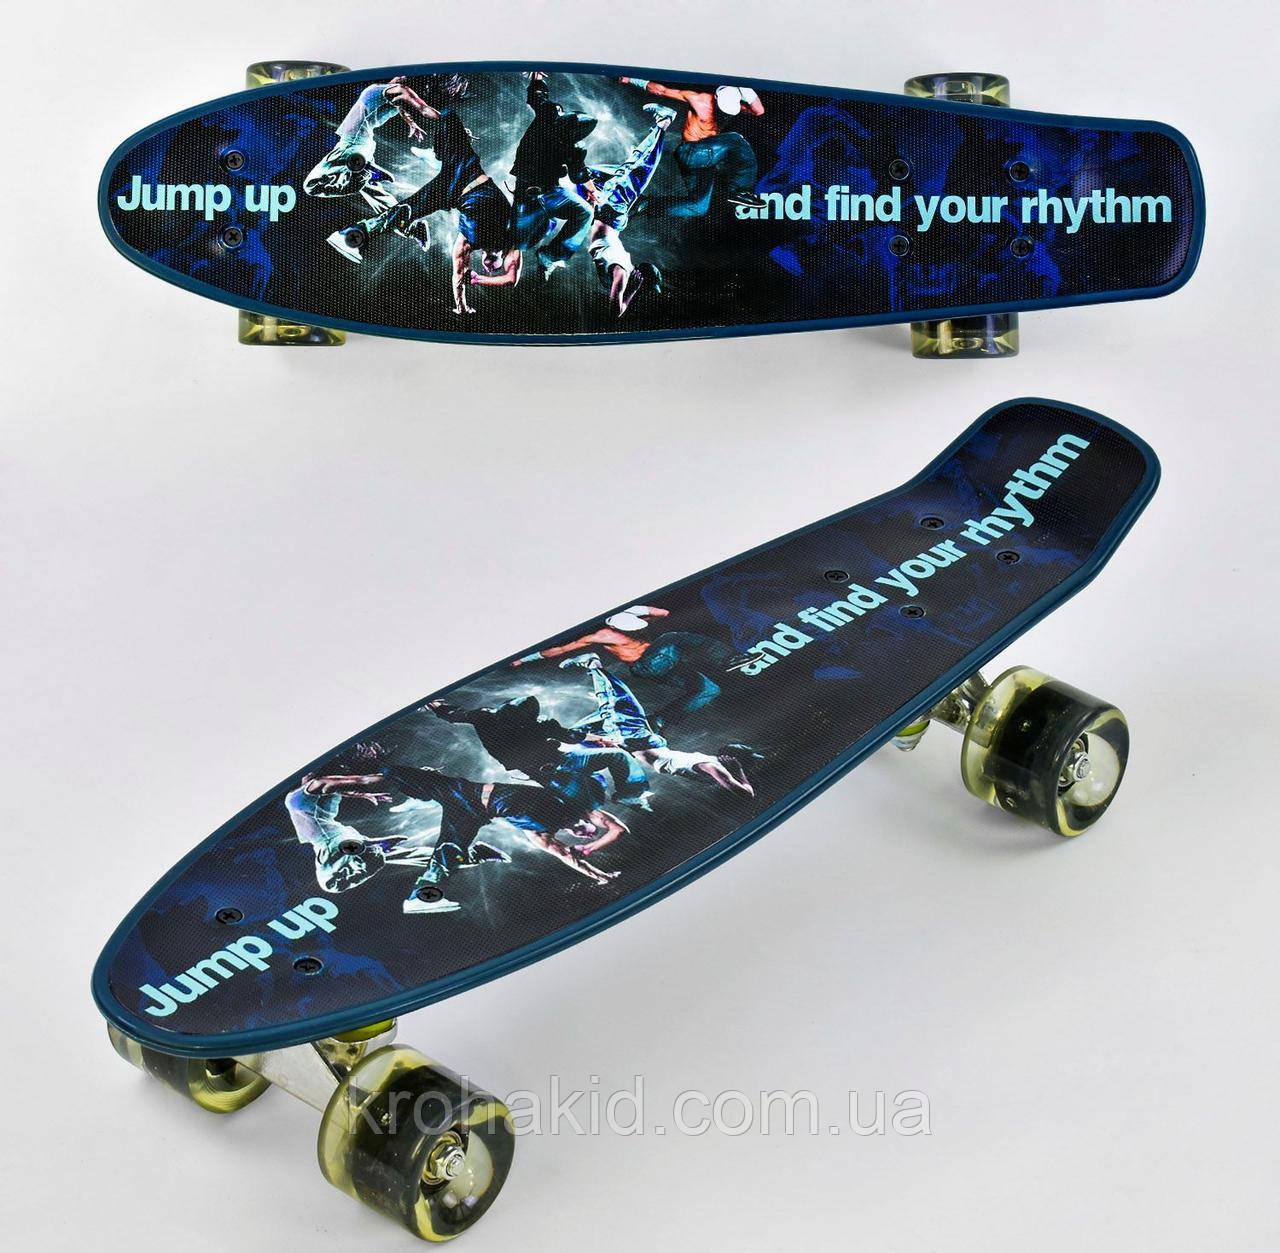 Скейт  Р 13780 Best Board, доска=55см, колёса PU, СВЕТЯТСЯ, d=6см